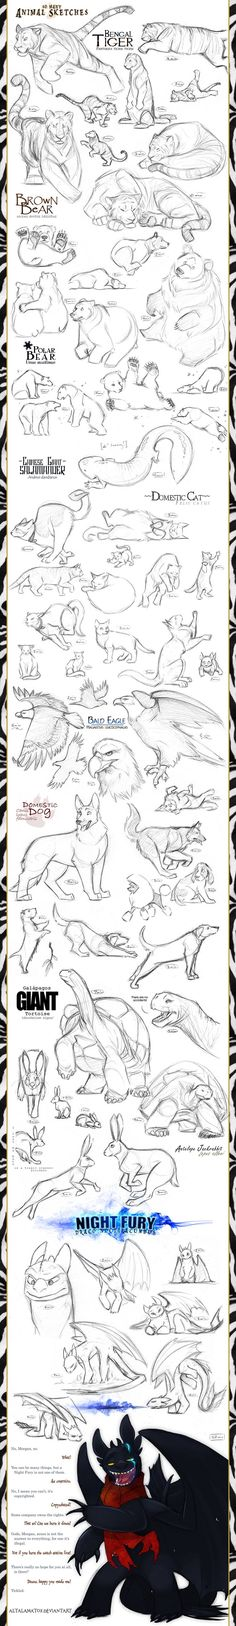 Animal Sketches by http://Altalamatox.deviantart.com on @deviantART || CHARACTER DESIGN REFERENCES | Find more at